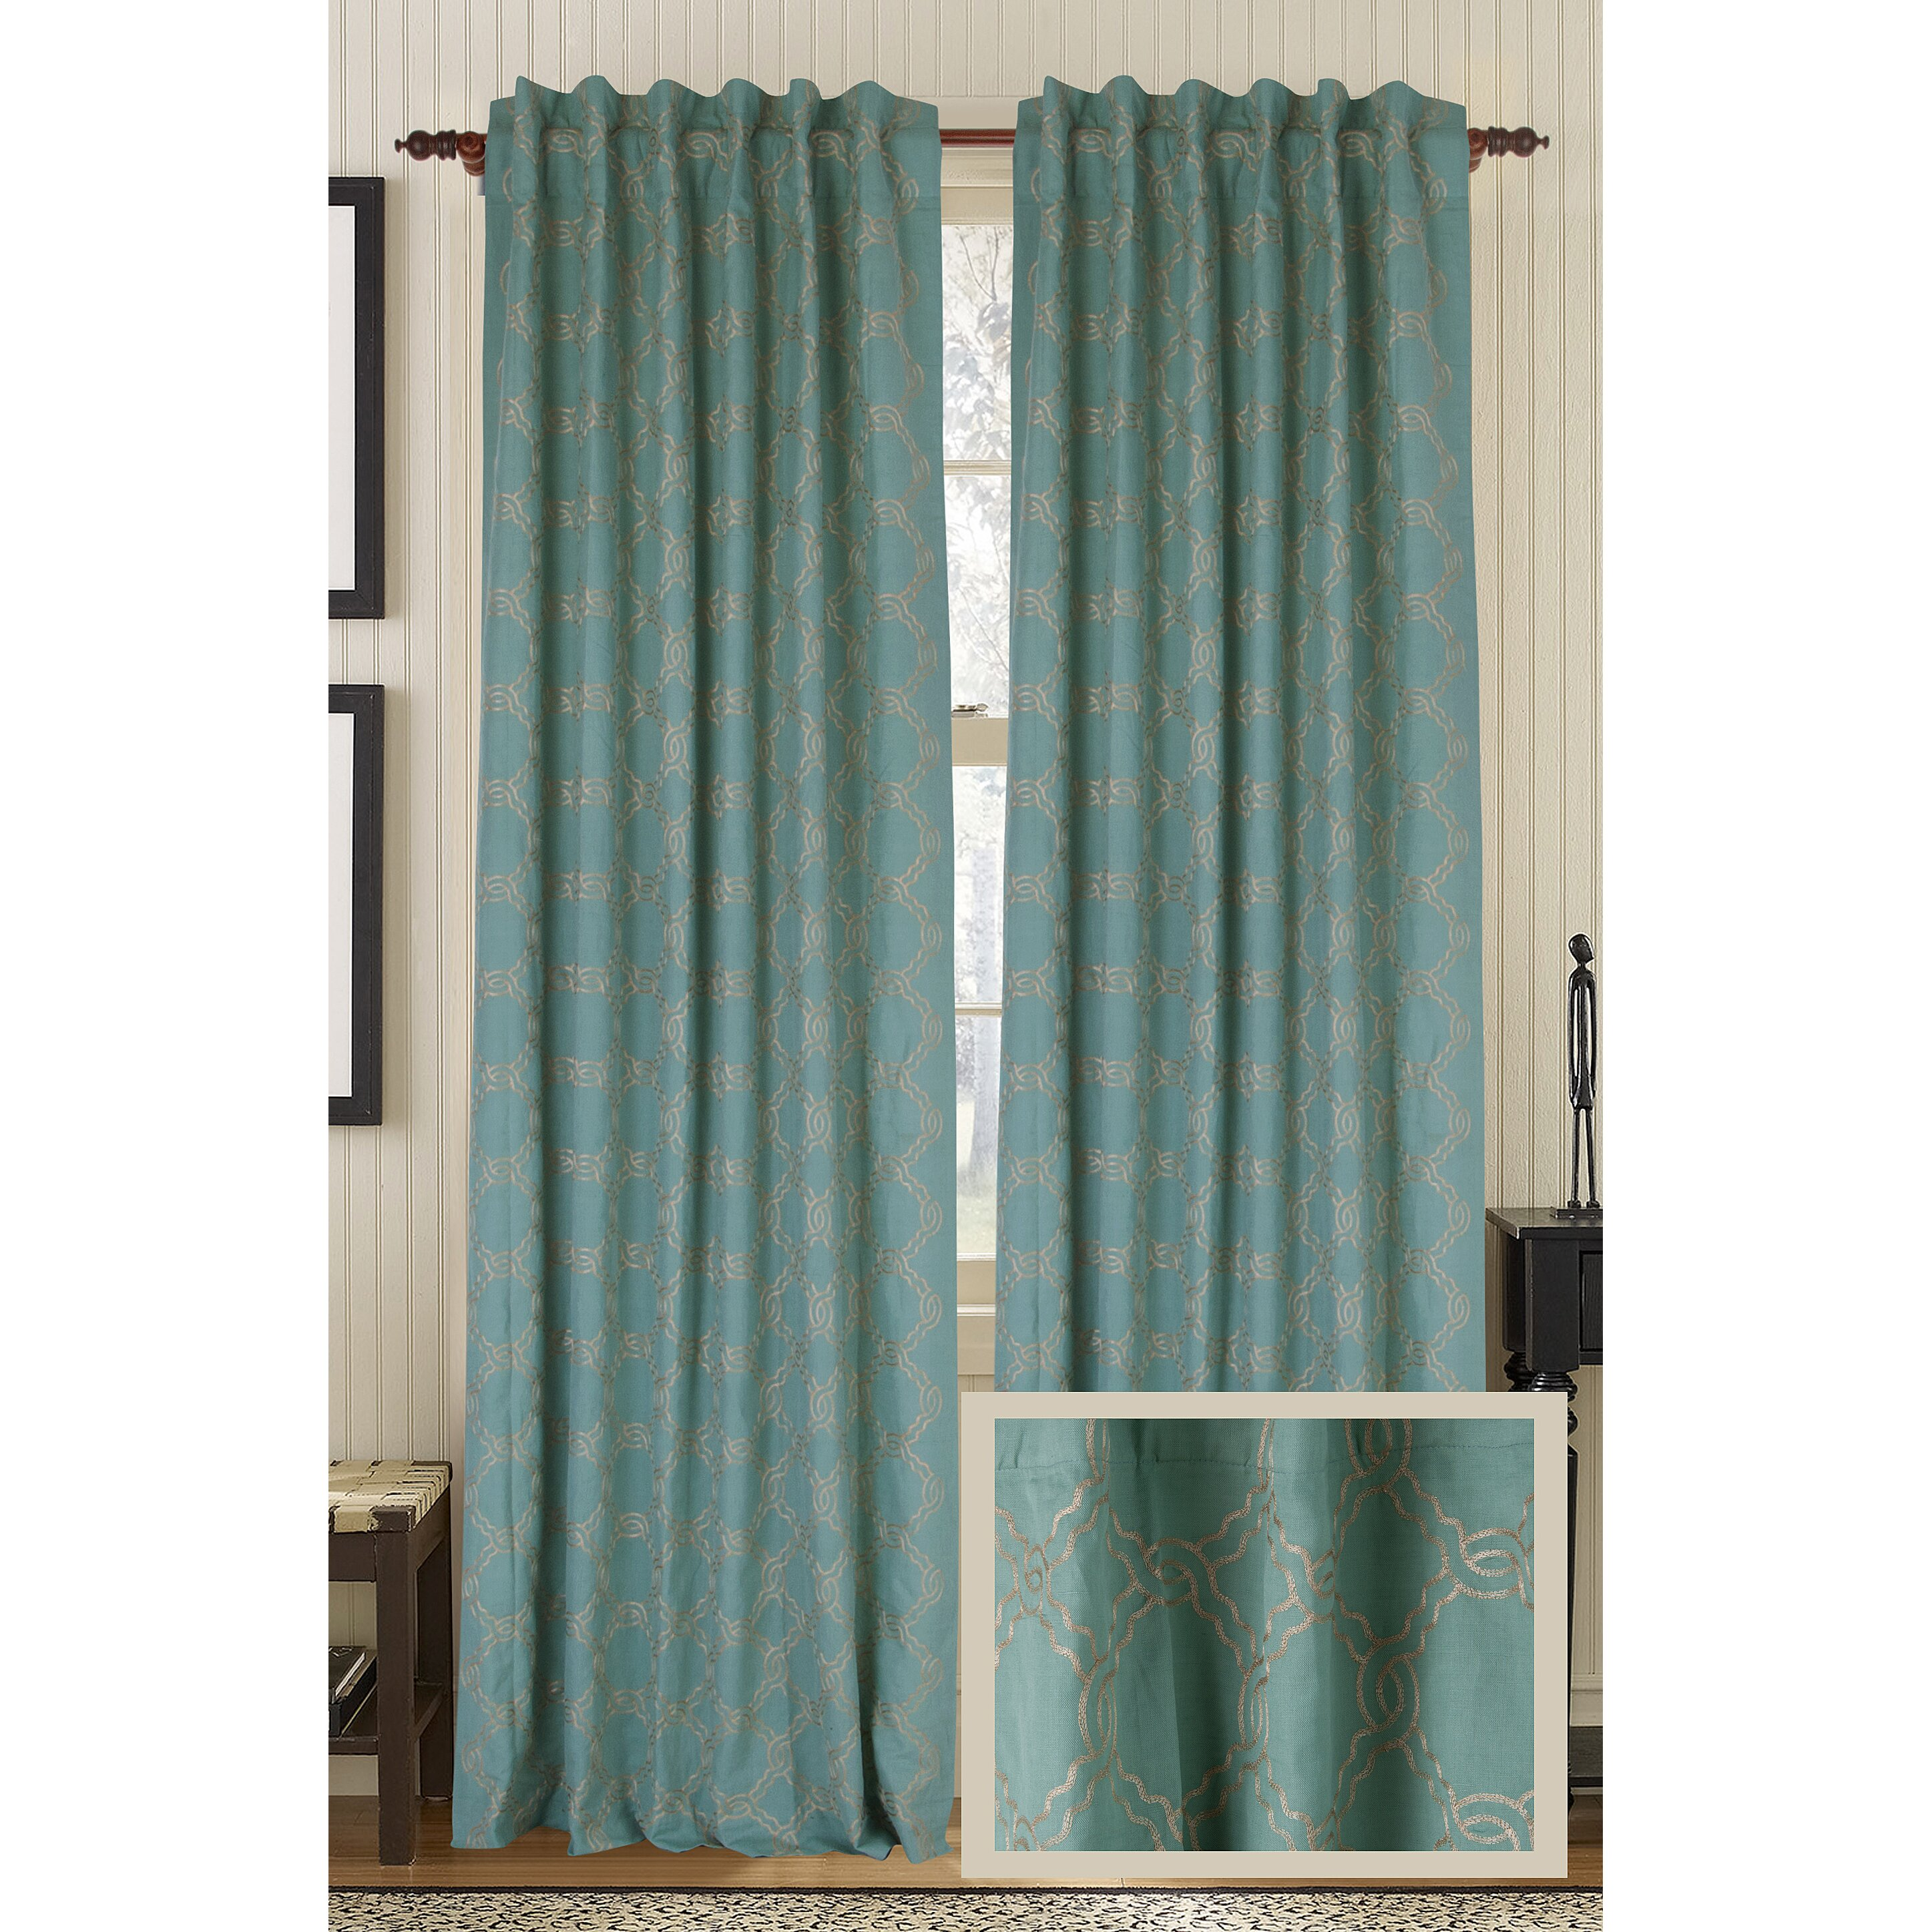 Gracious Living Zen Rod Linen Cotton Blend Pocket Single Curtain Panel Reviews Wayfair